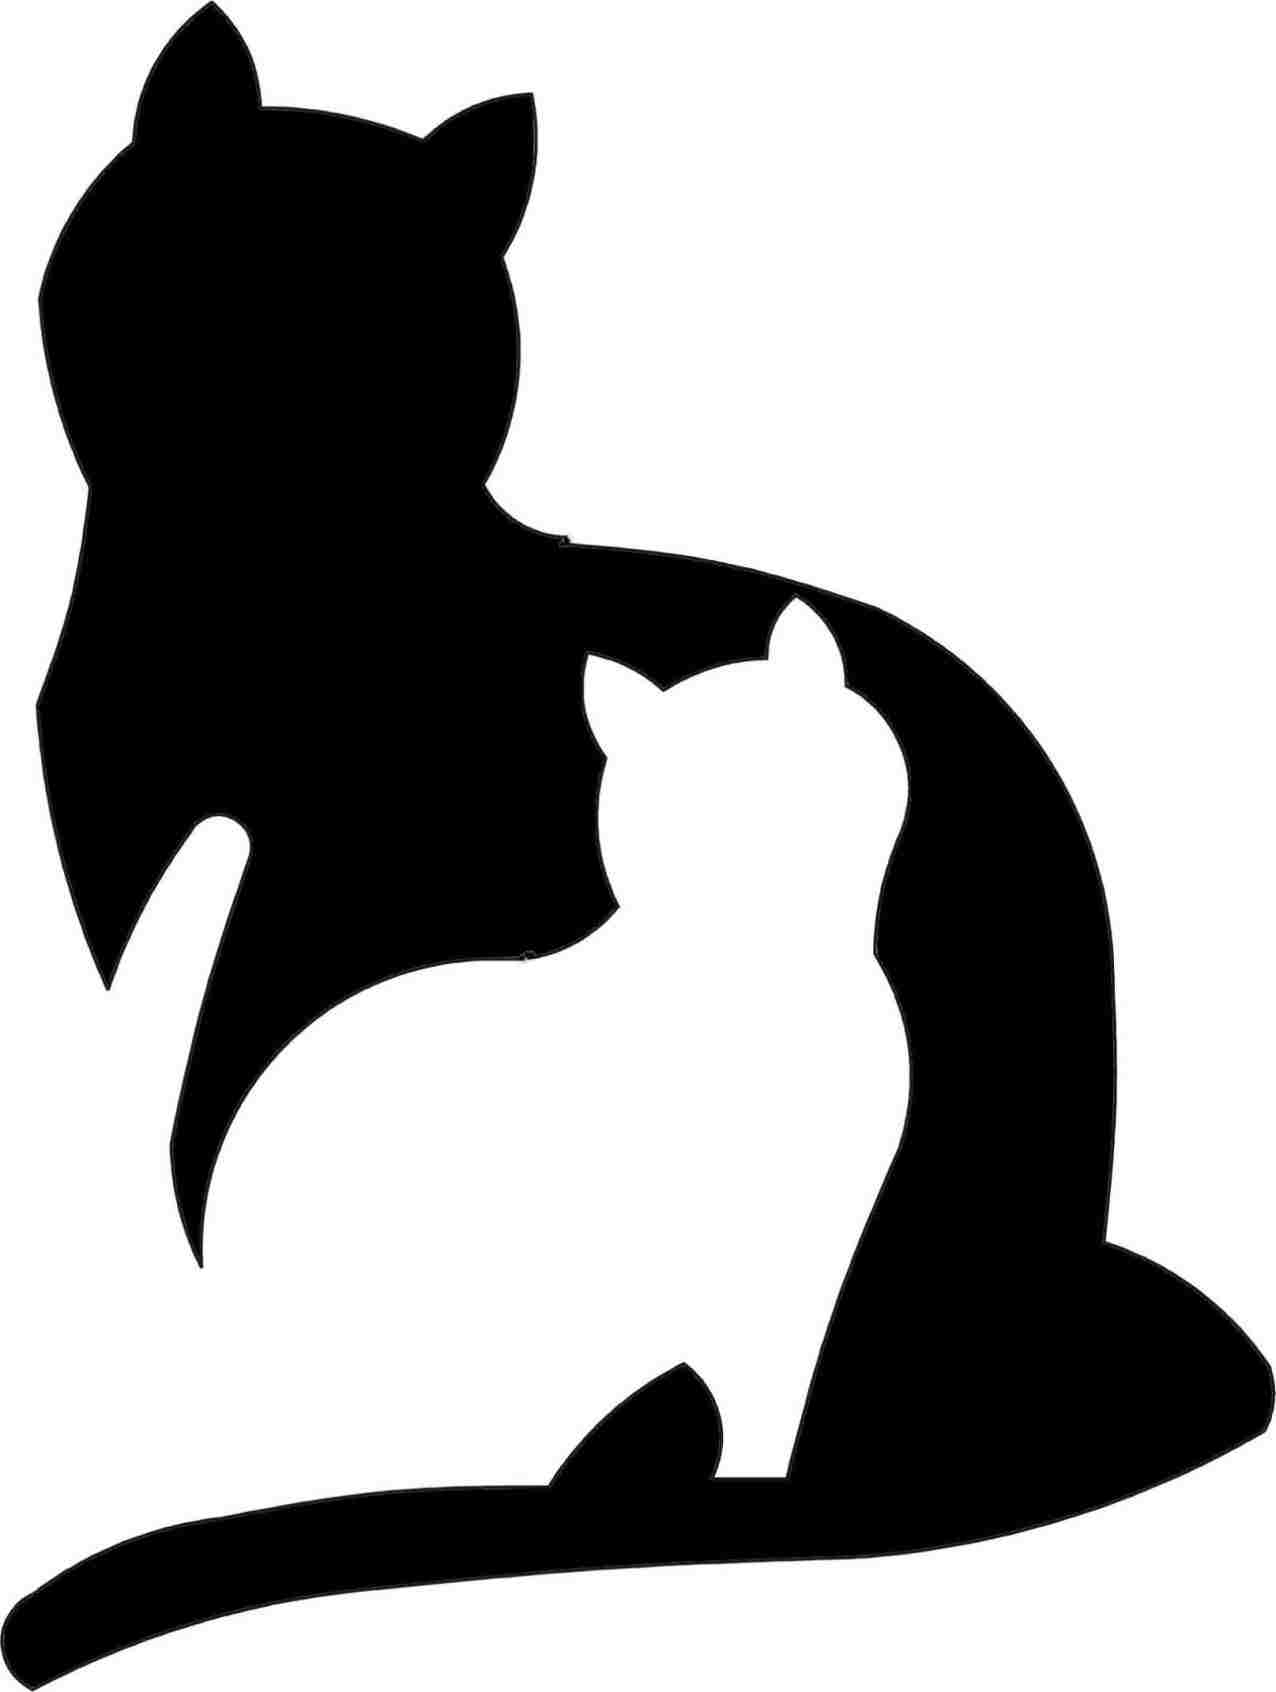 1276x1692 Download Rhcom Wallpaper Simple Black Cat Drawing